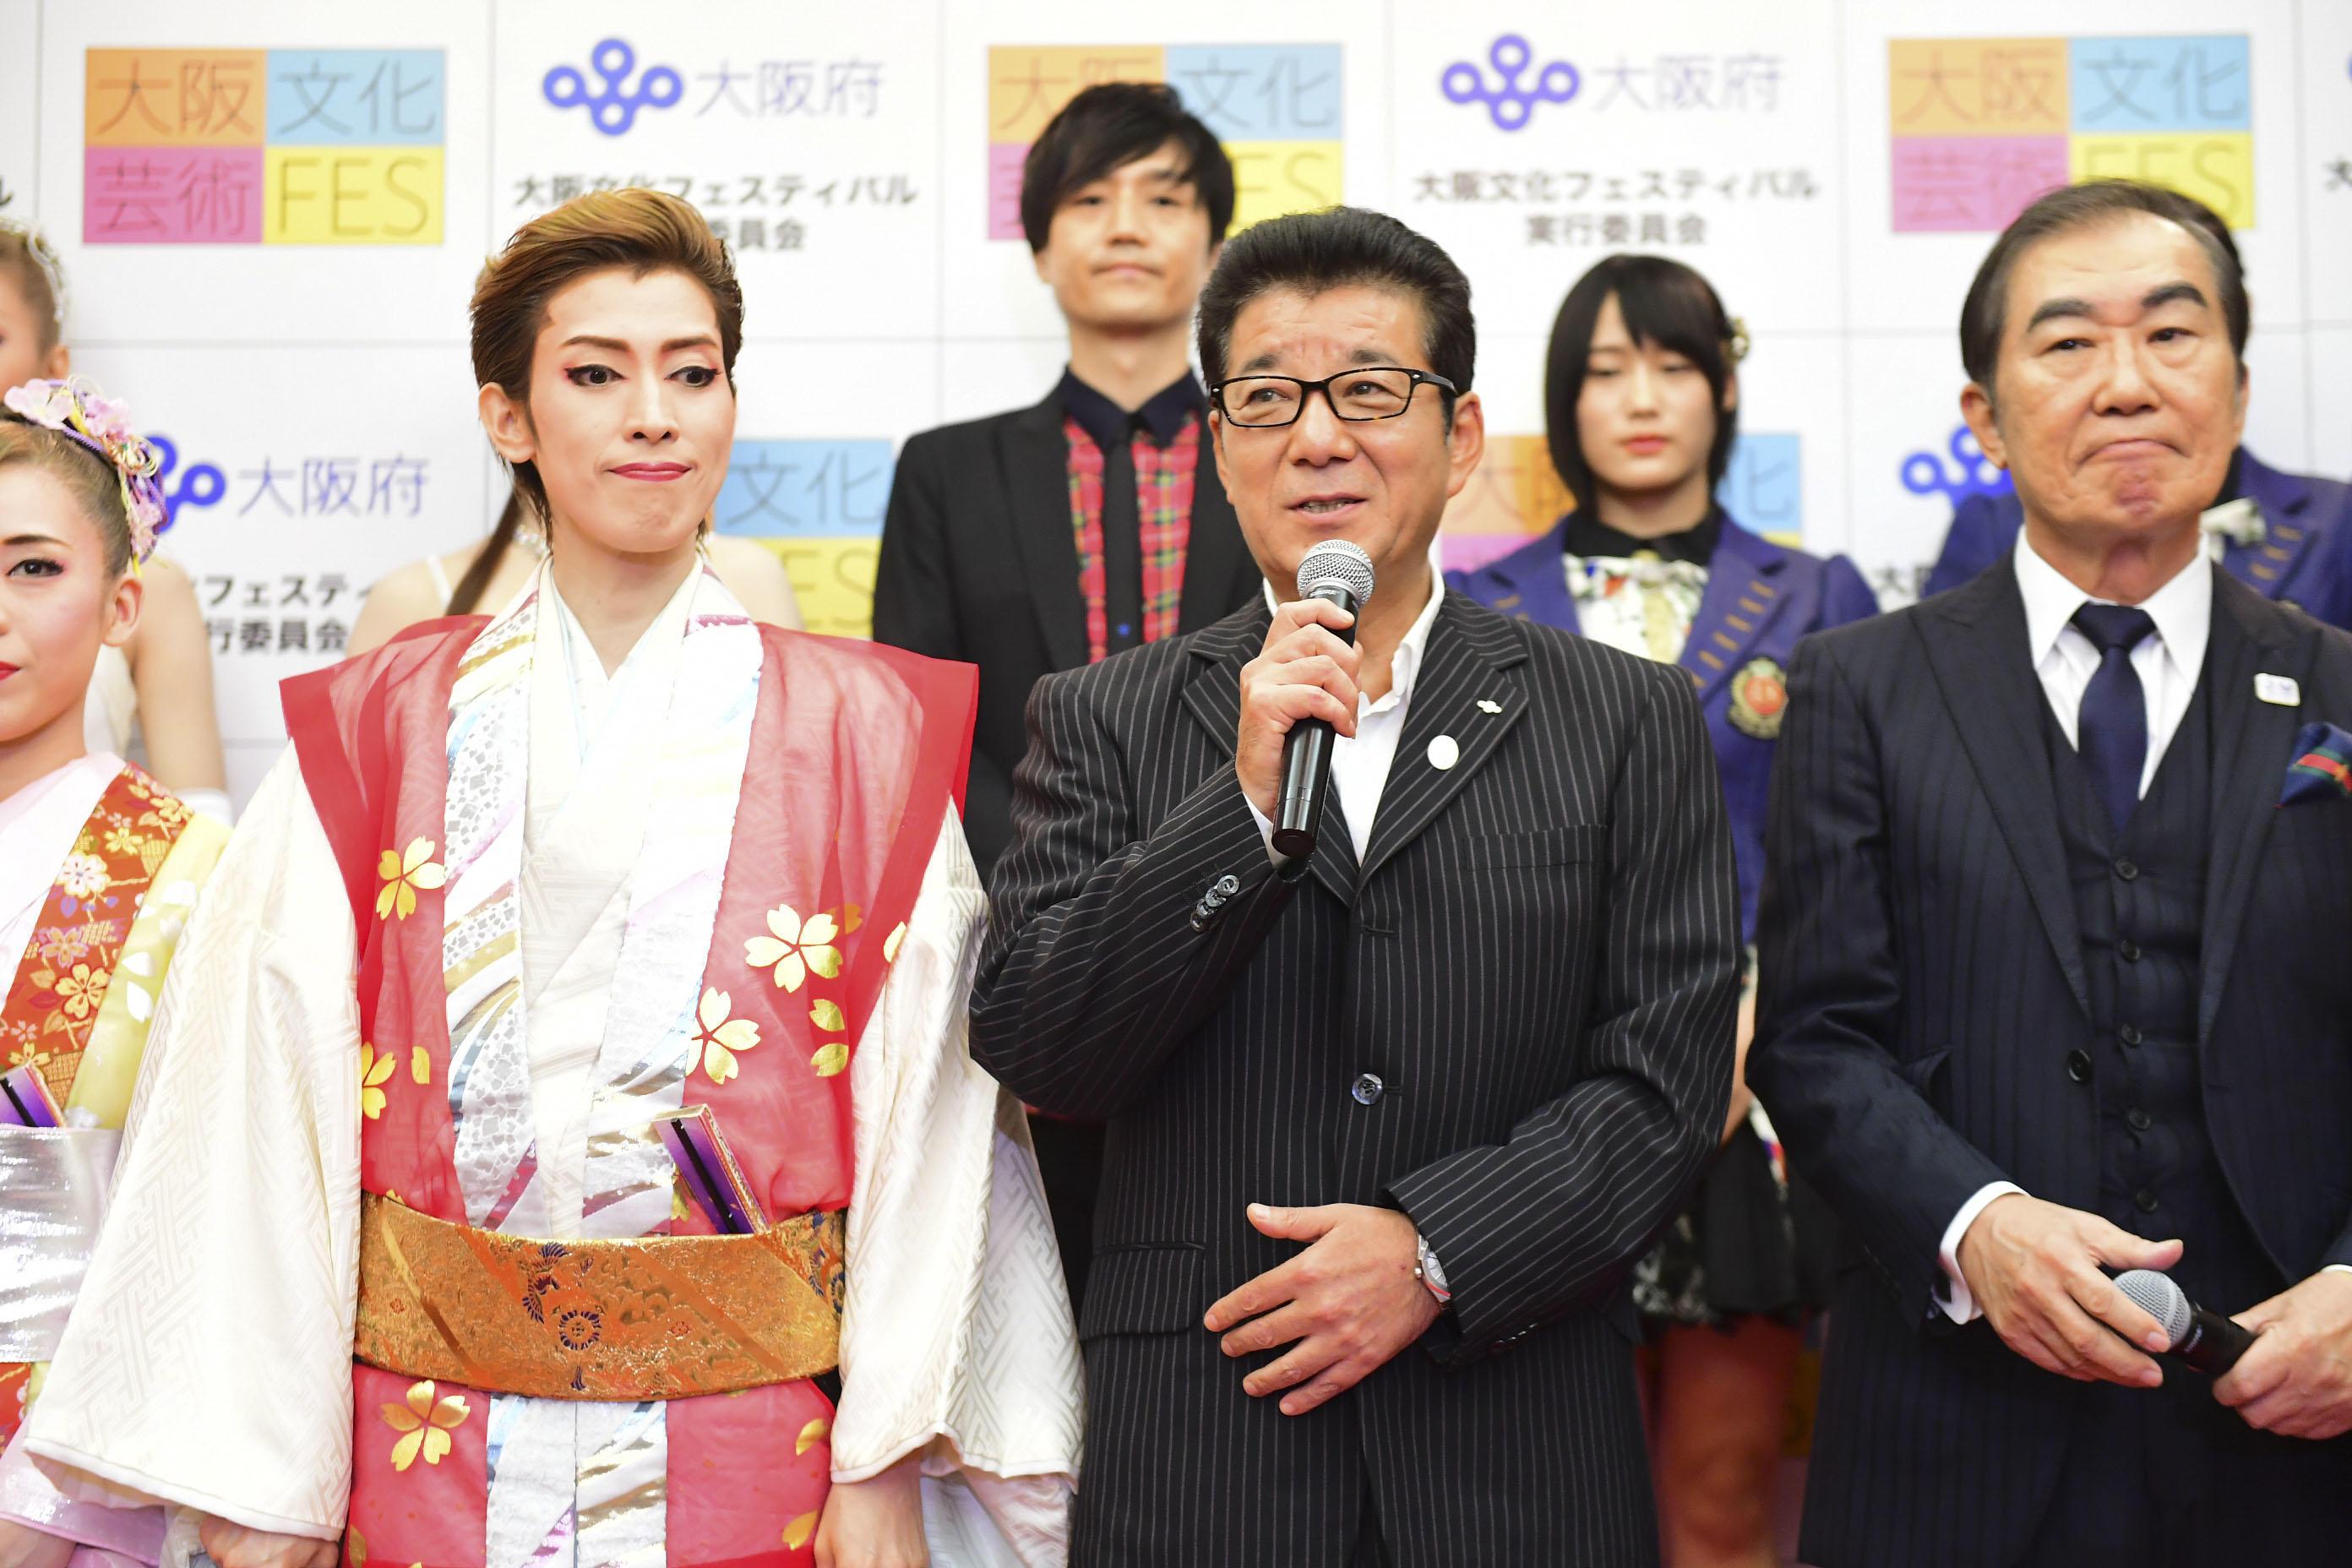 http://news.yoshimoto.co.jp/20170927101731-eafe3ff223a9a8825a2ac681af0246c3fdc745ef.jpg